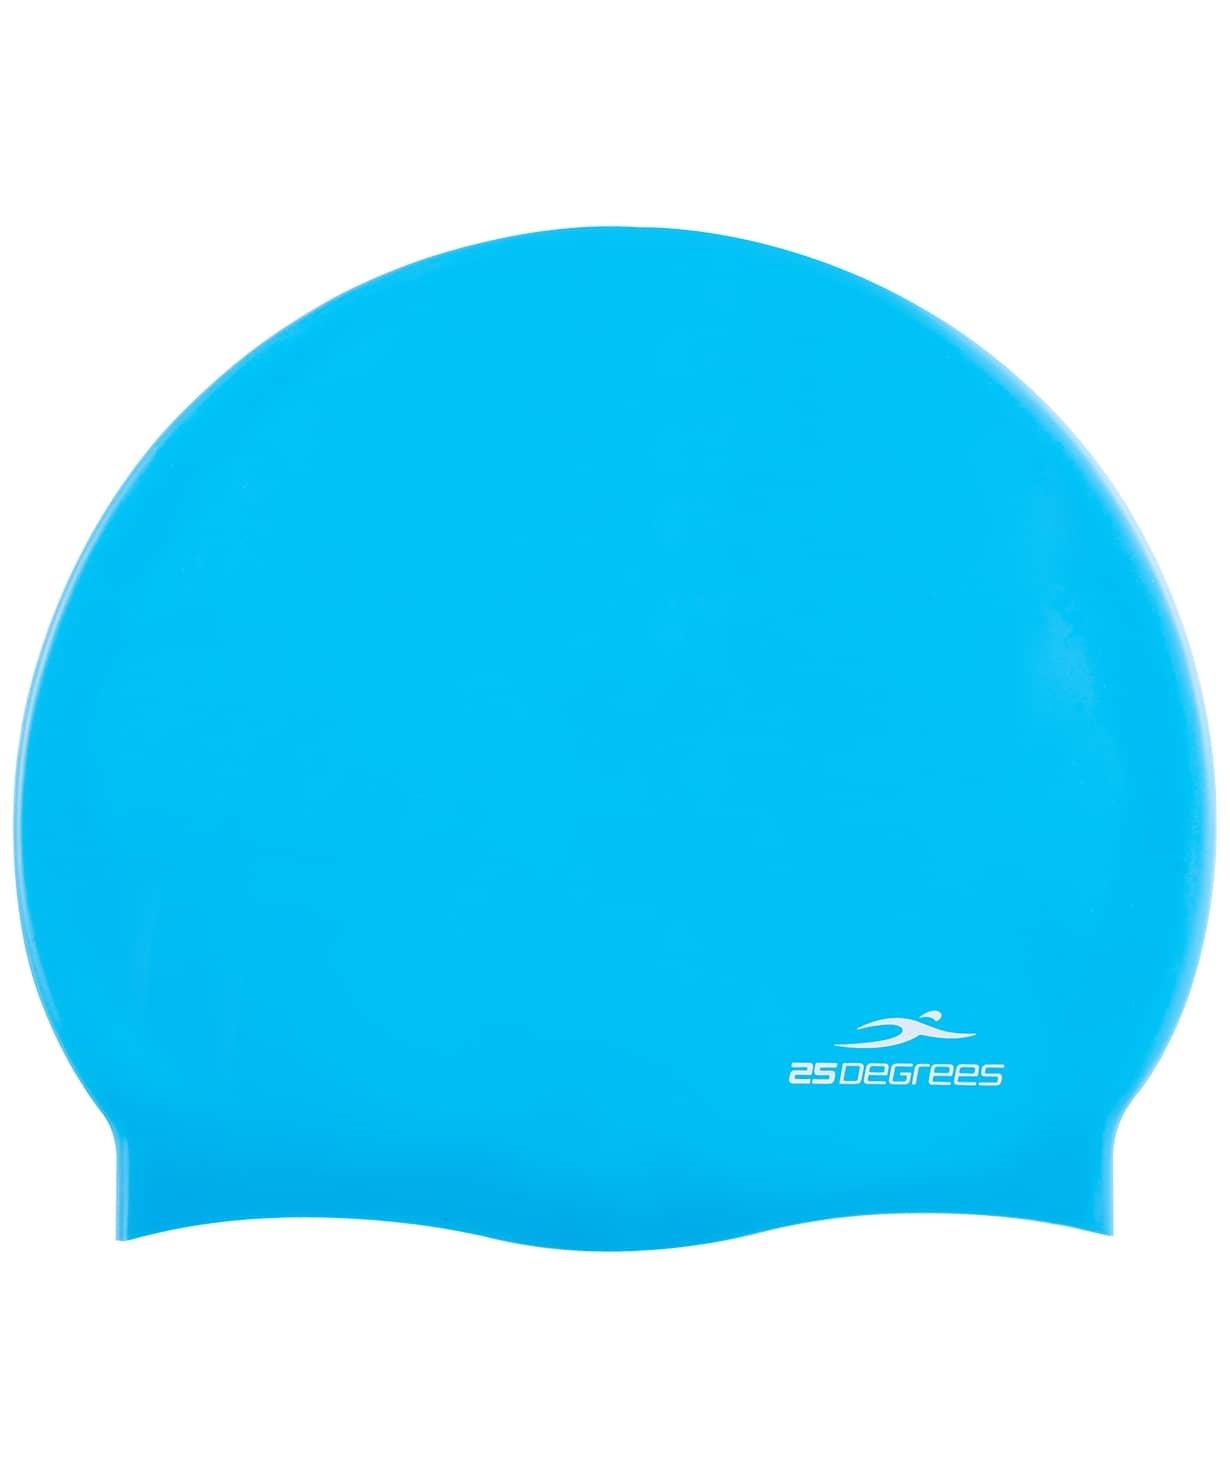 Шапочка для плавания Nuance Blue, силикон